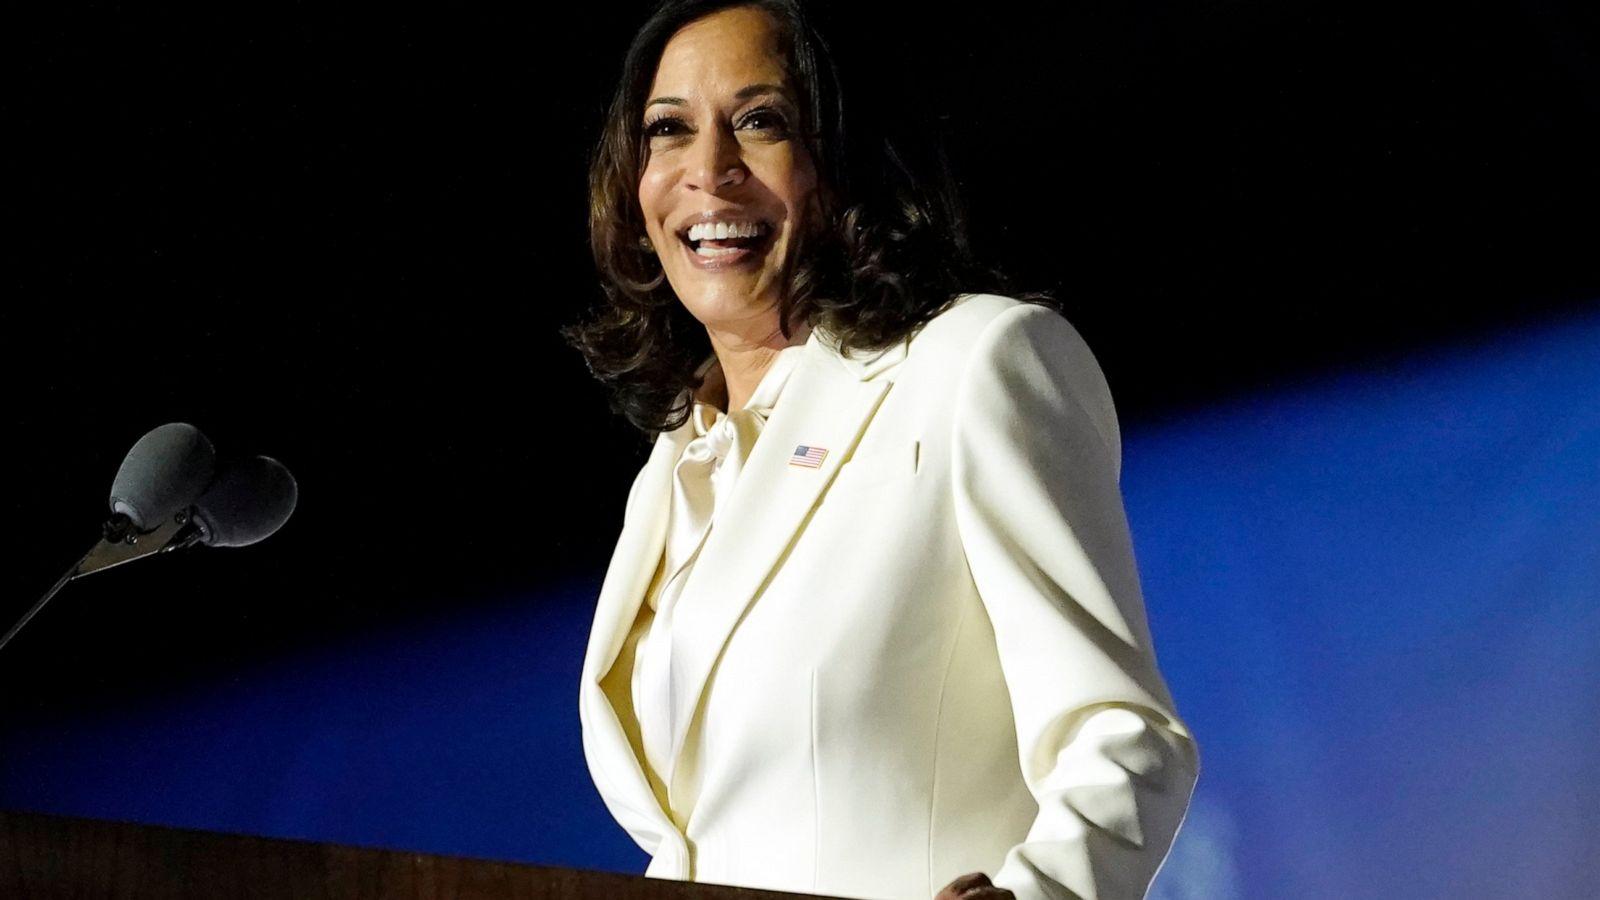 abcnews.go.com -  ALEXANDRA JAFFE Associated Press - Harris prepares for central role in Biden's White House